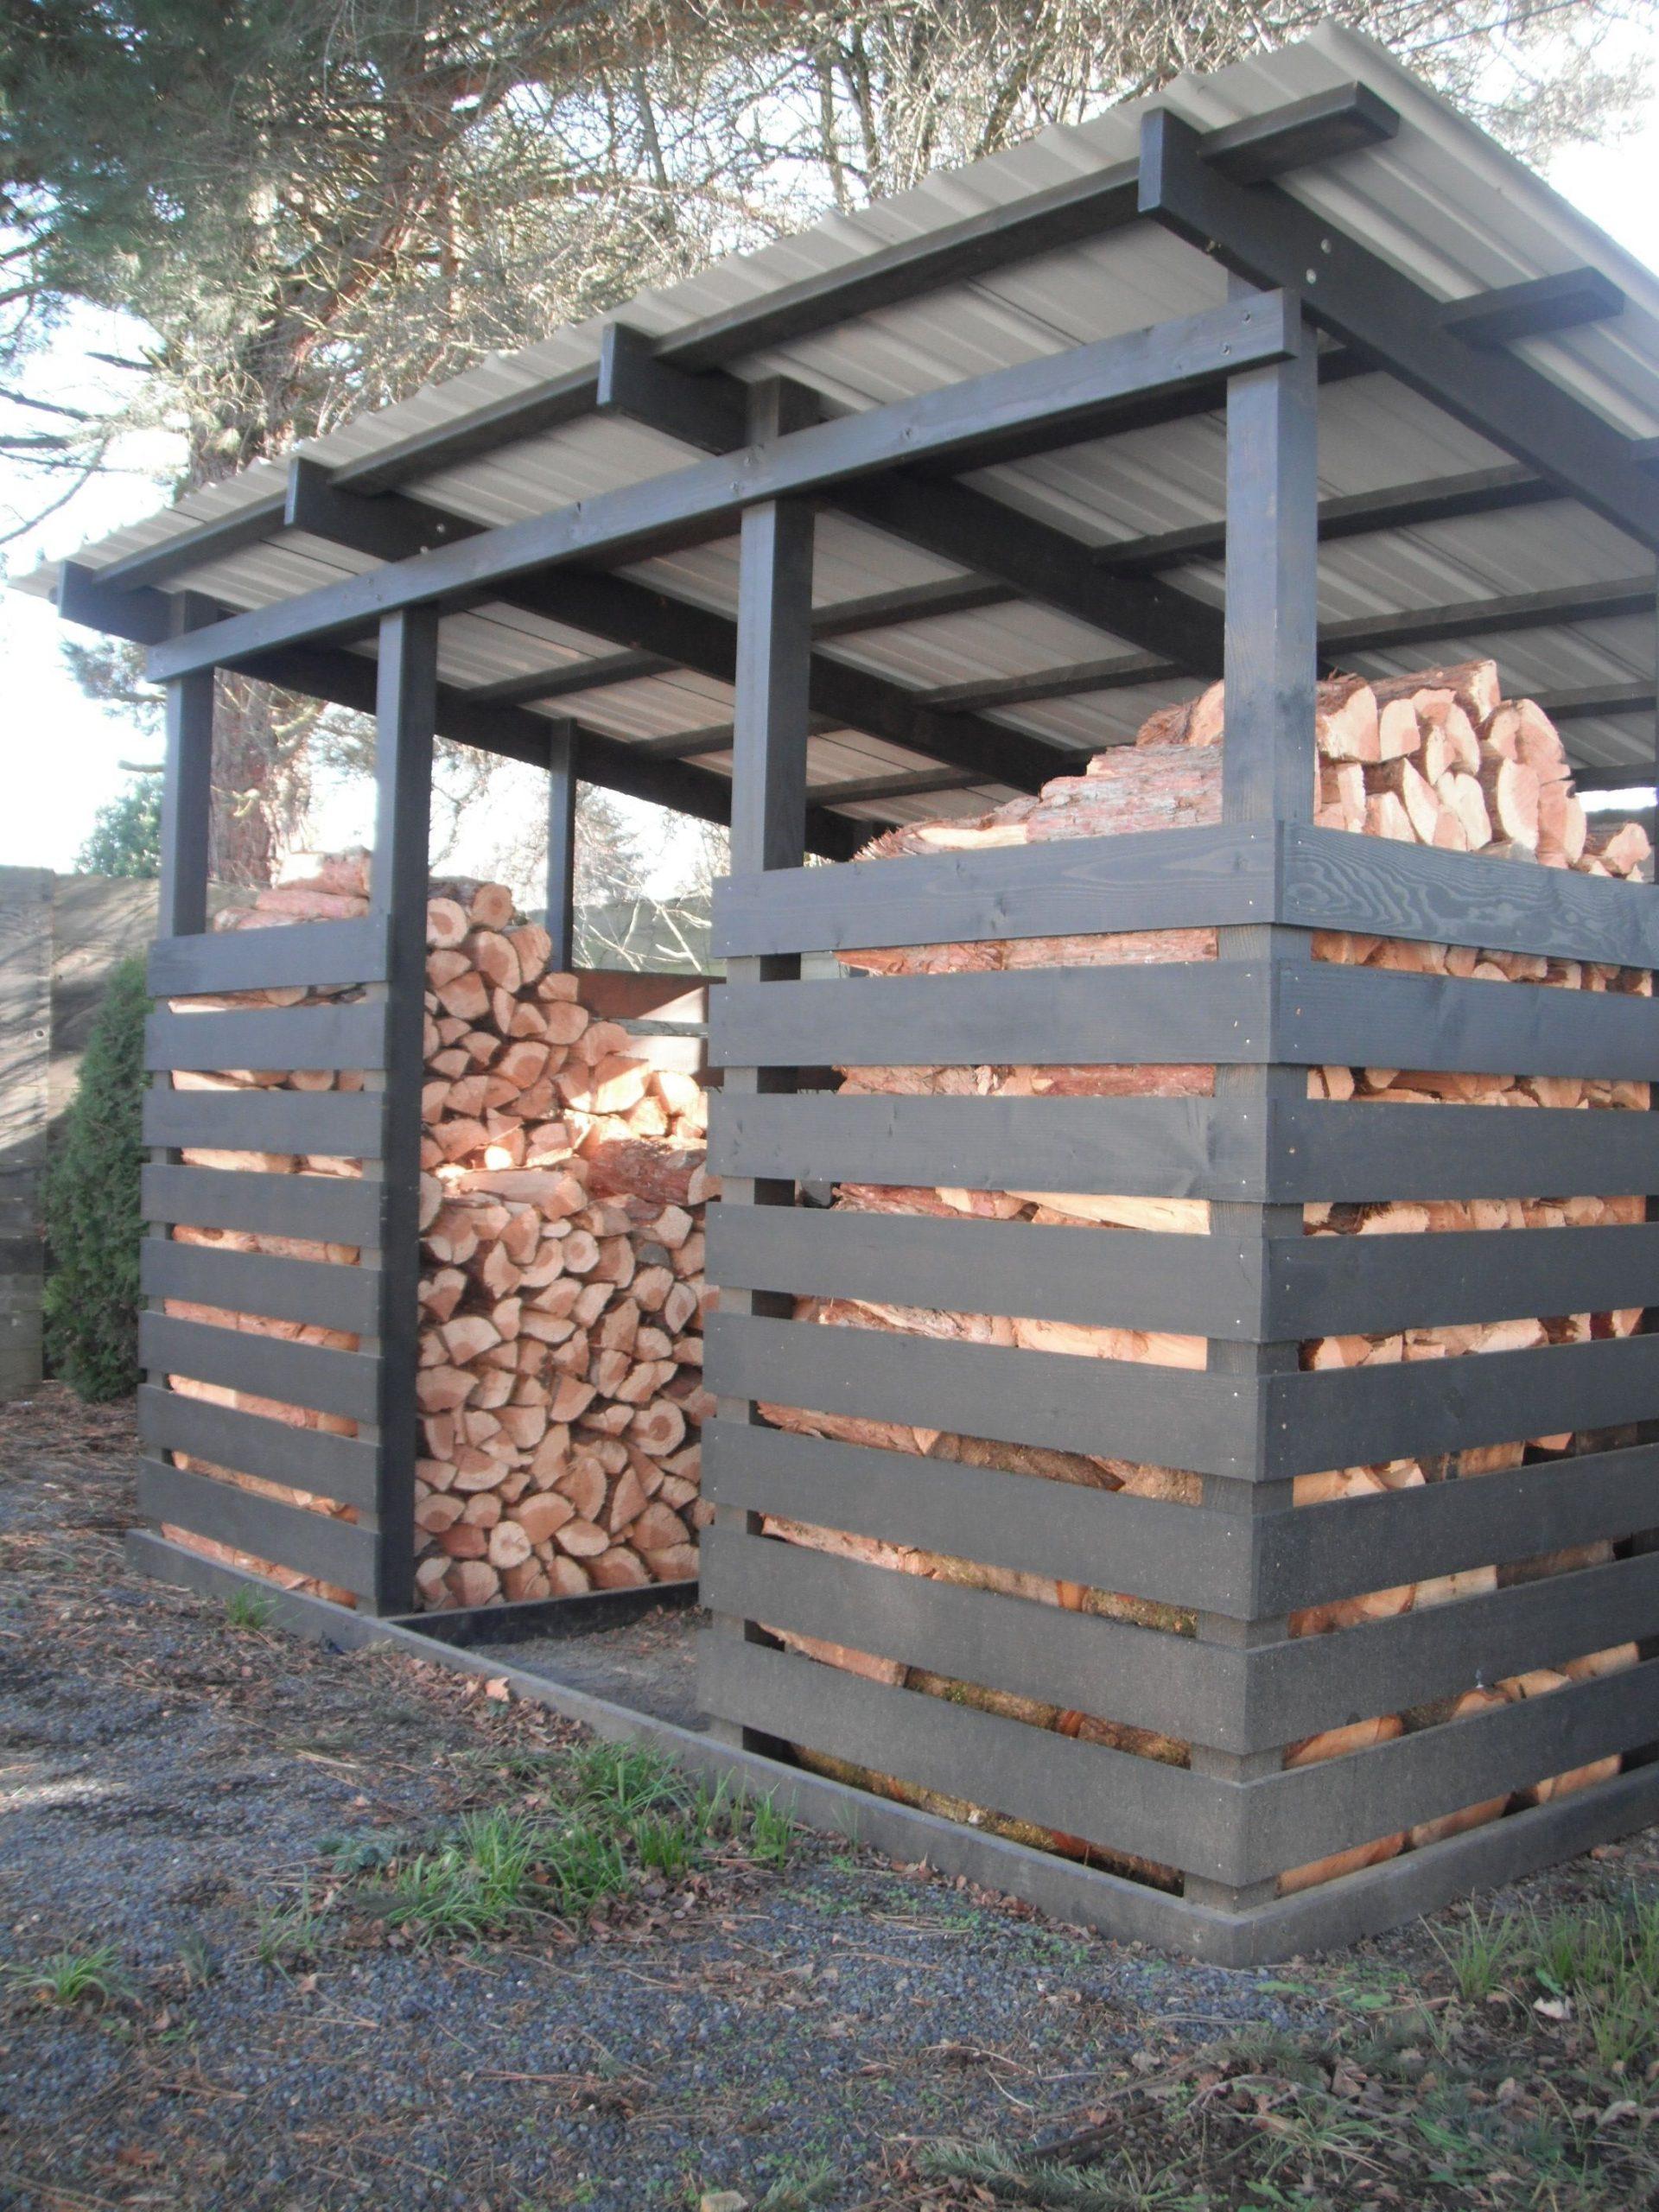 Rangement Bois | Abri Bois De Chauffage, Amenagement Jardin ... serapportantà Hangar Jardin Bois